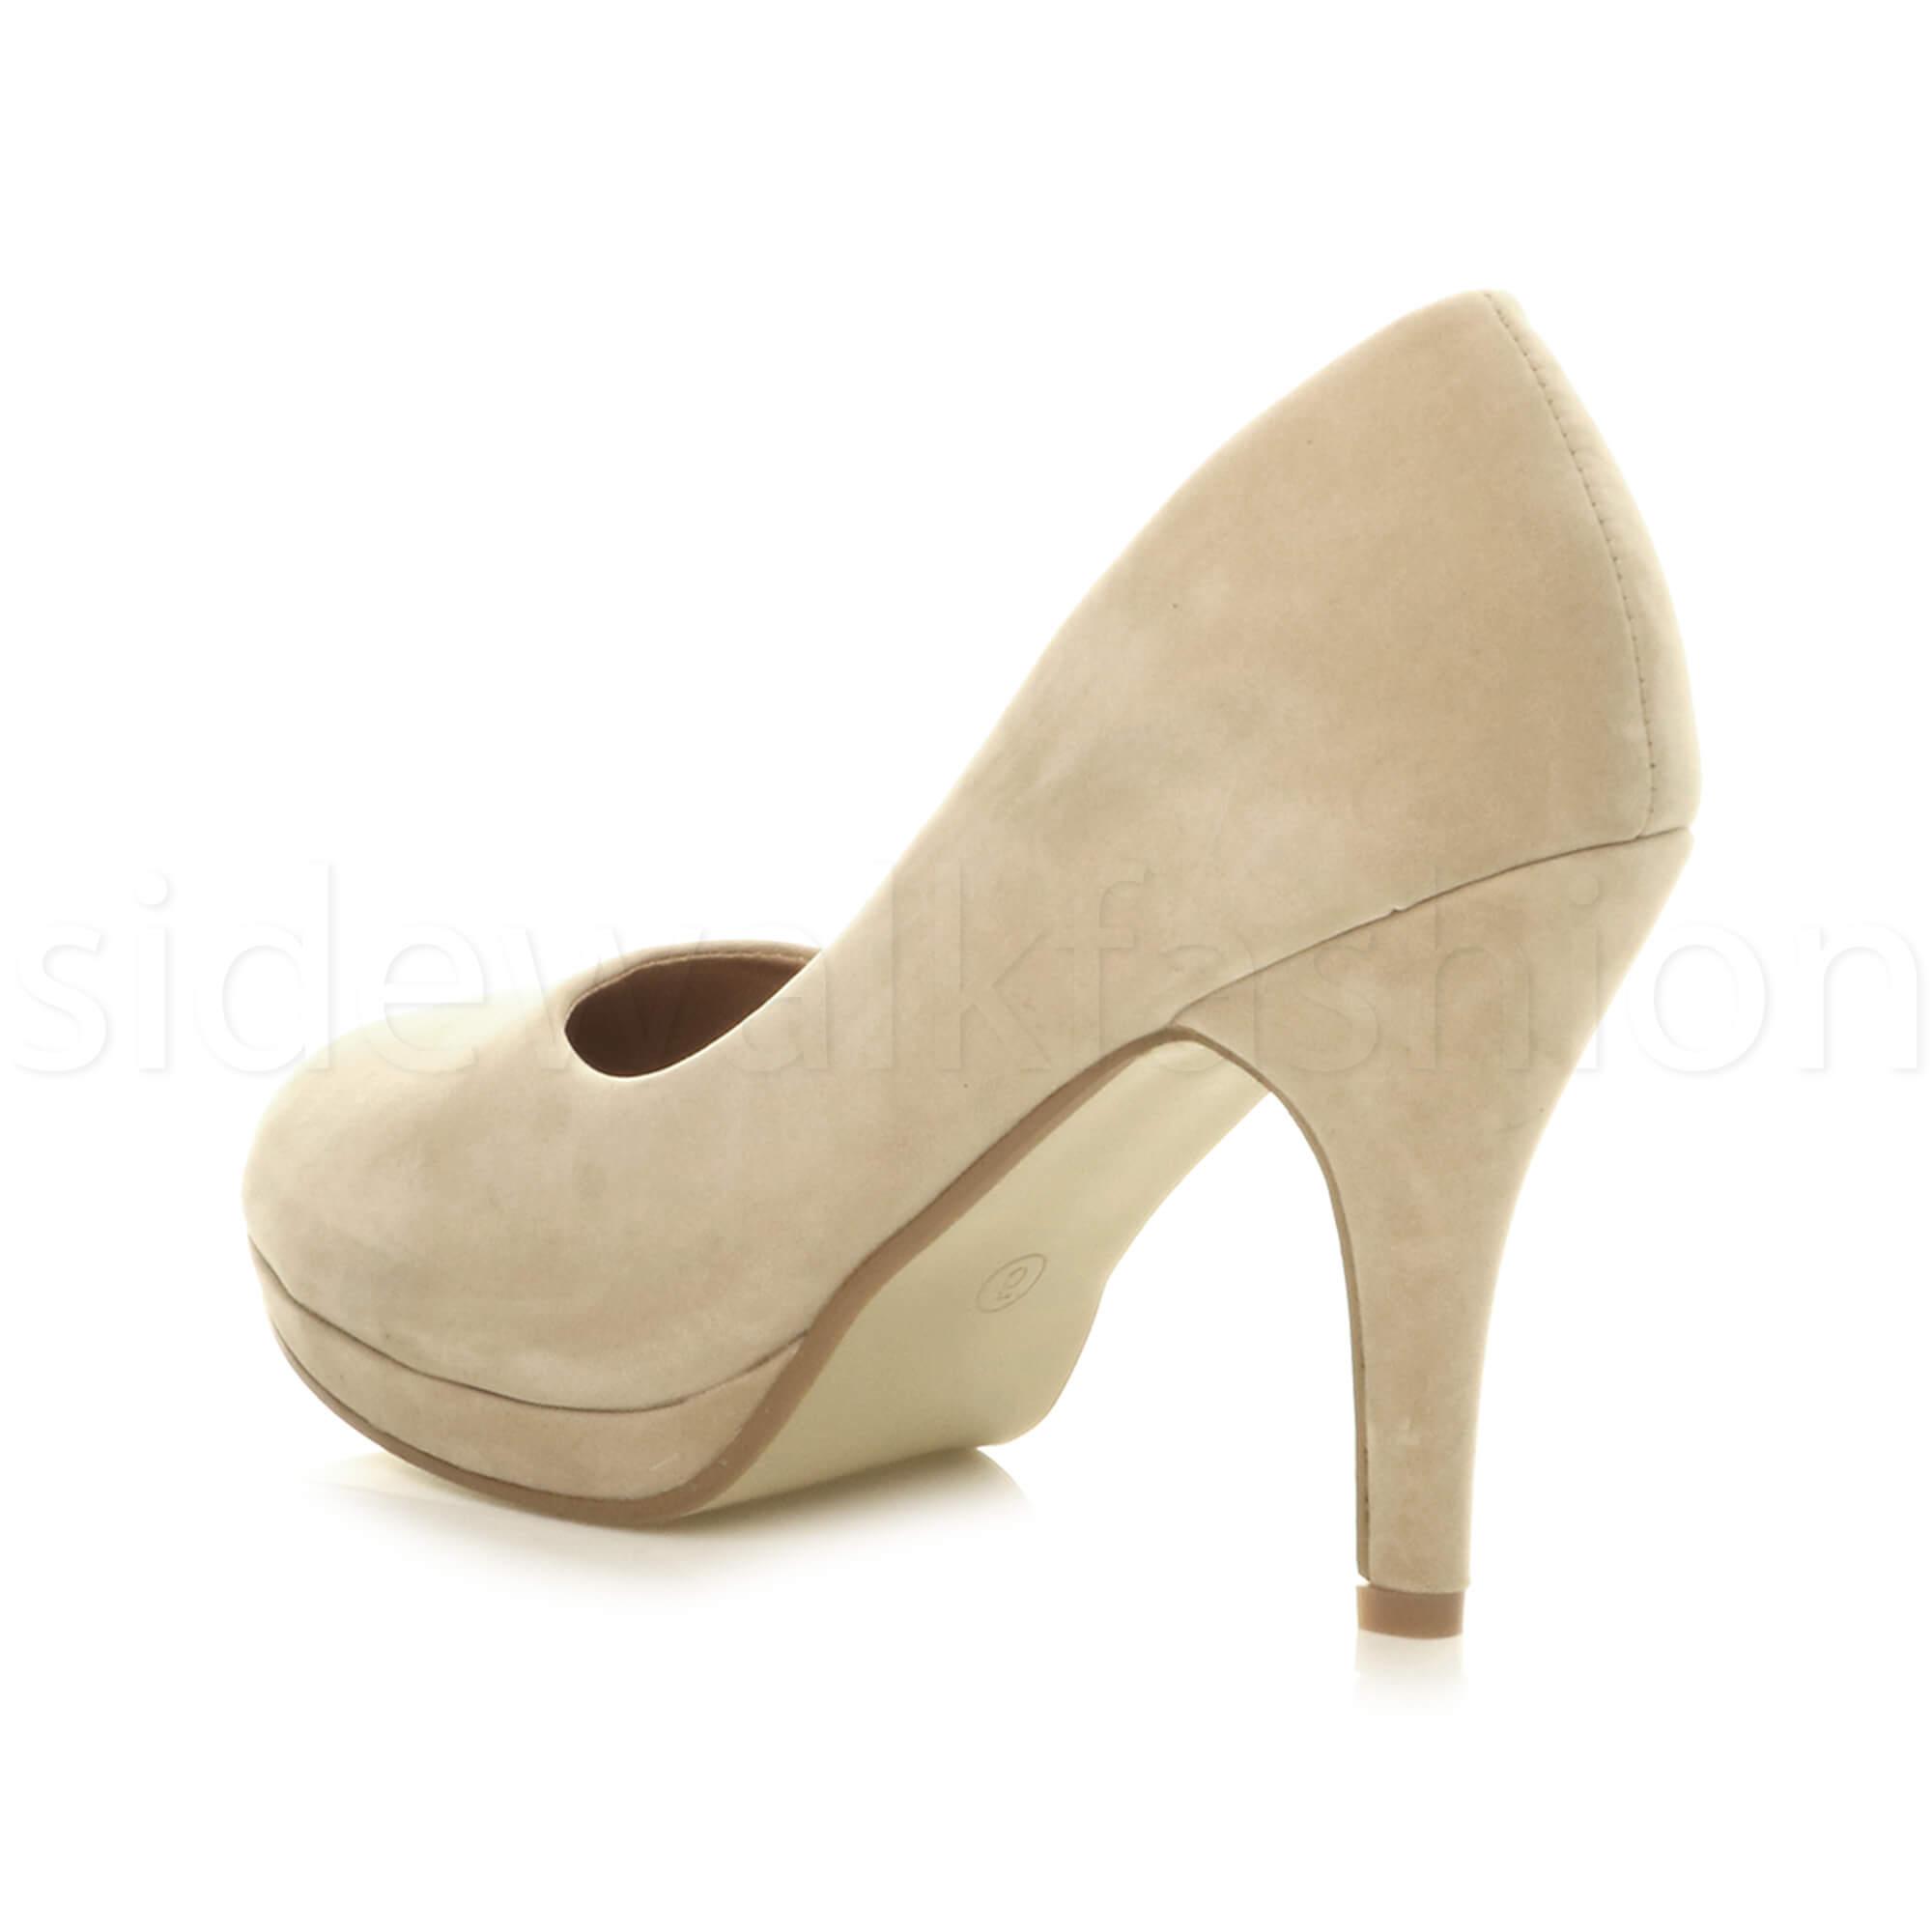 Womens-ladies-high-mid-heel-platform-wedding-evening-bridesmaid-court-shoes-size thumbnail 131